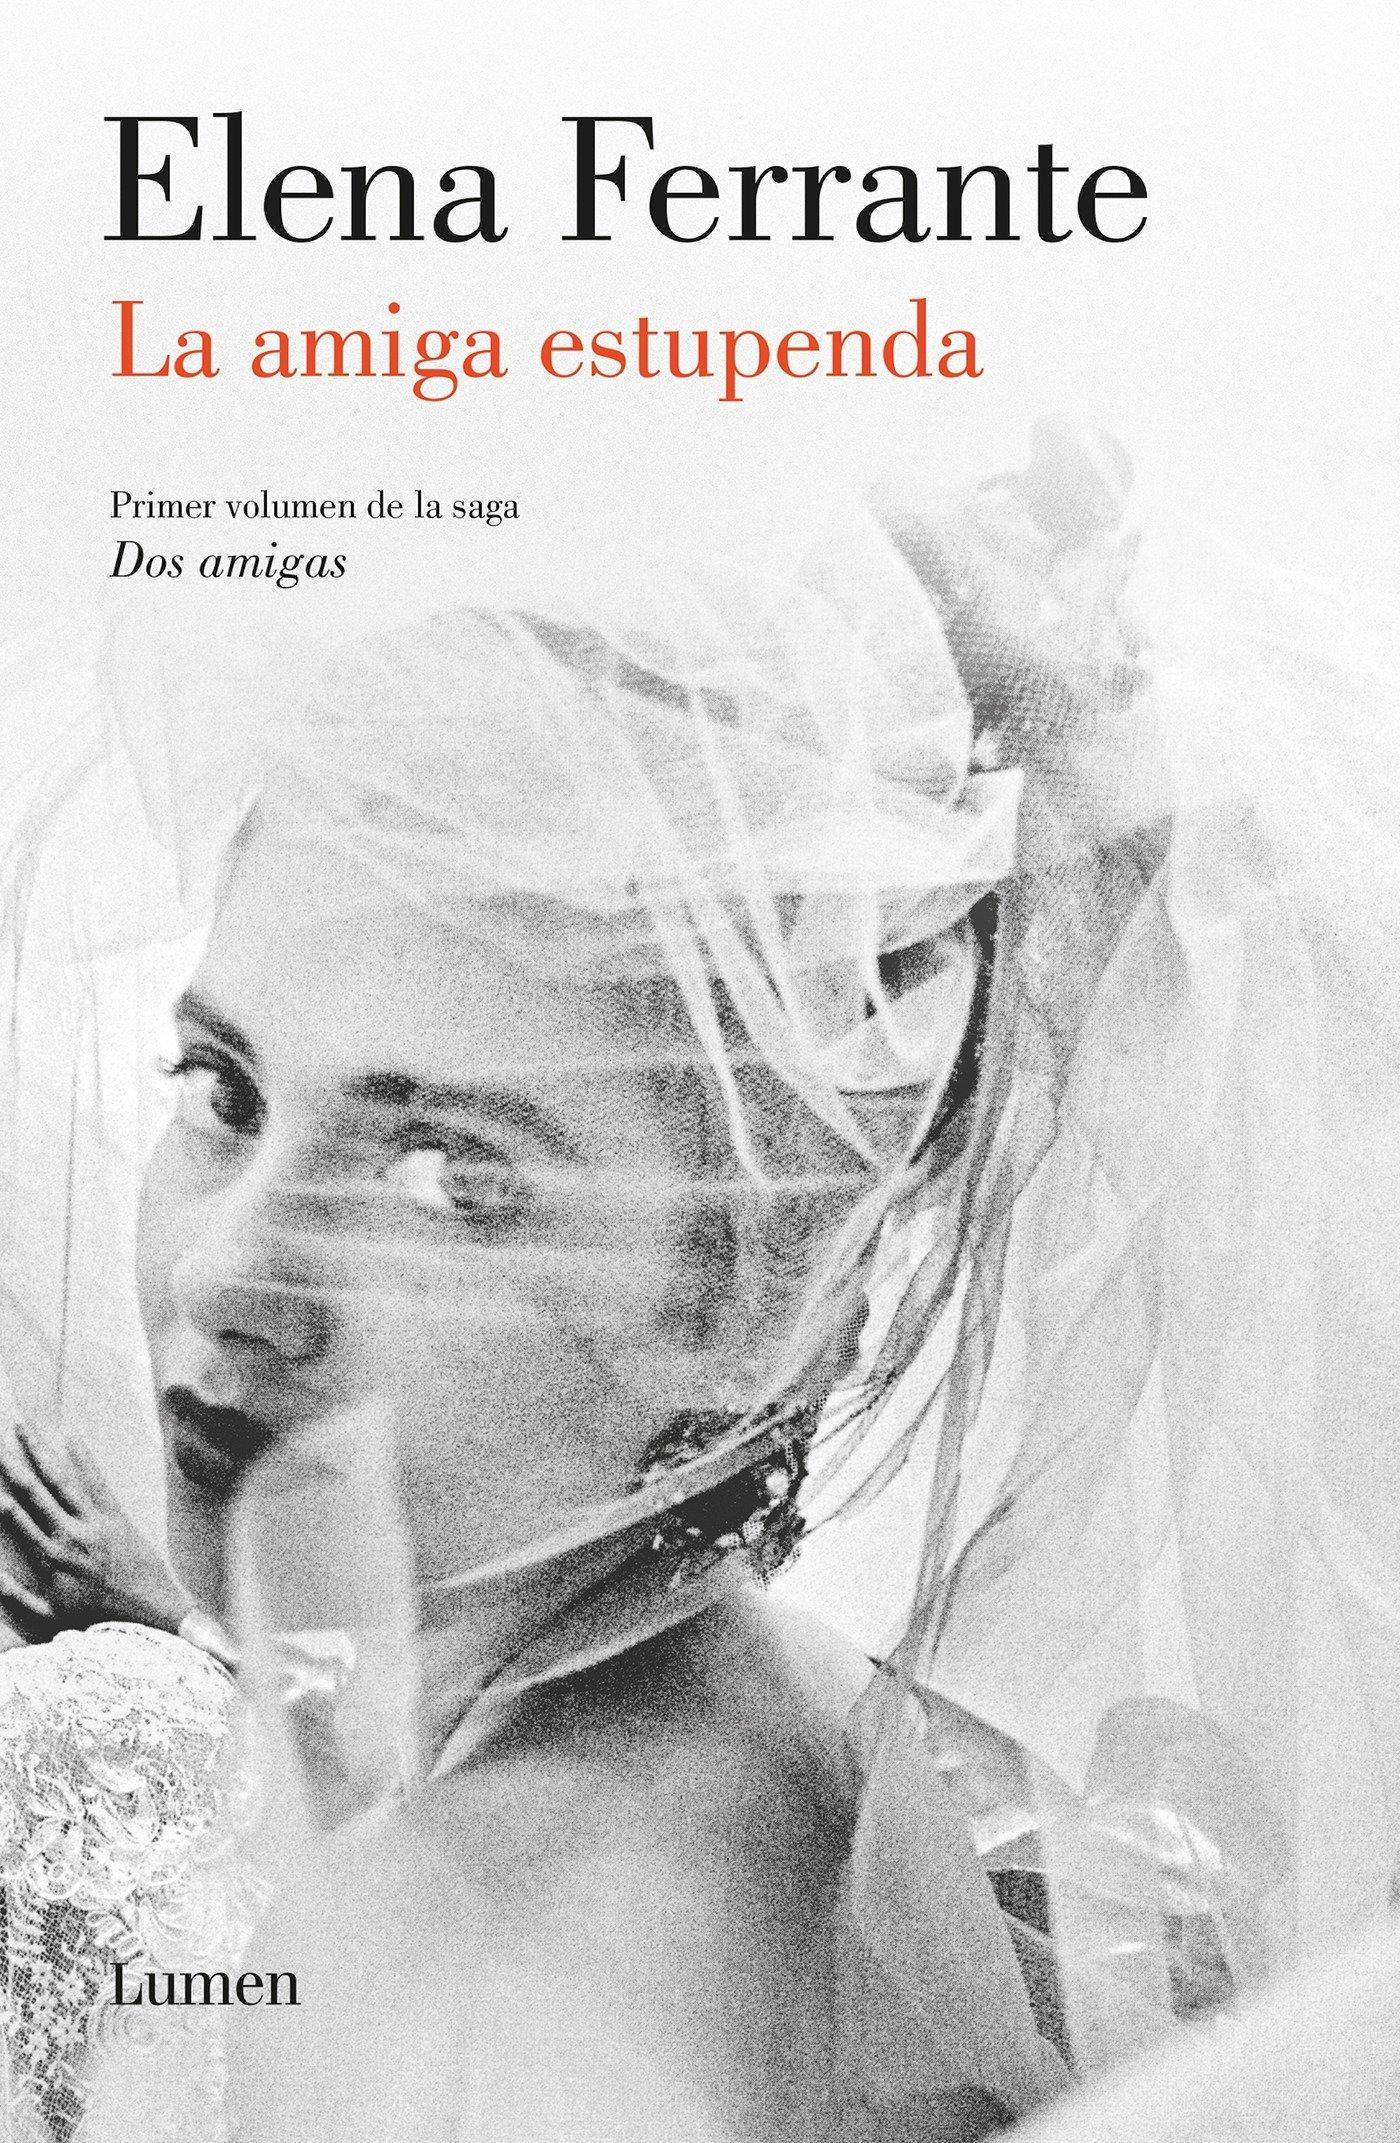 La amiga estupenda (Dos amigas 1)  / My Brilliant Friend: Neapolitan Novels, Book One (Dos Amigas / Neapolitan Novels)